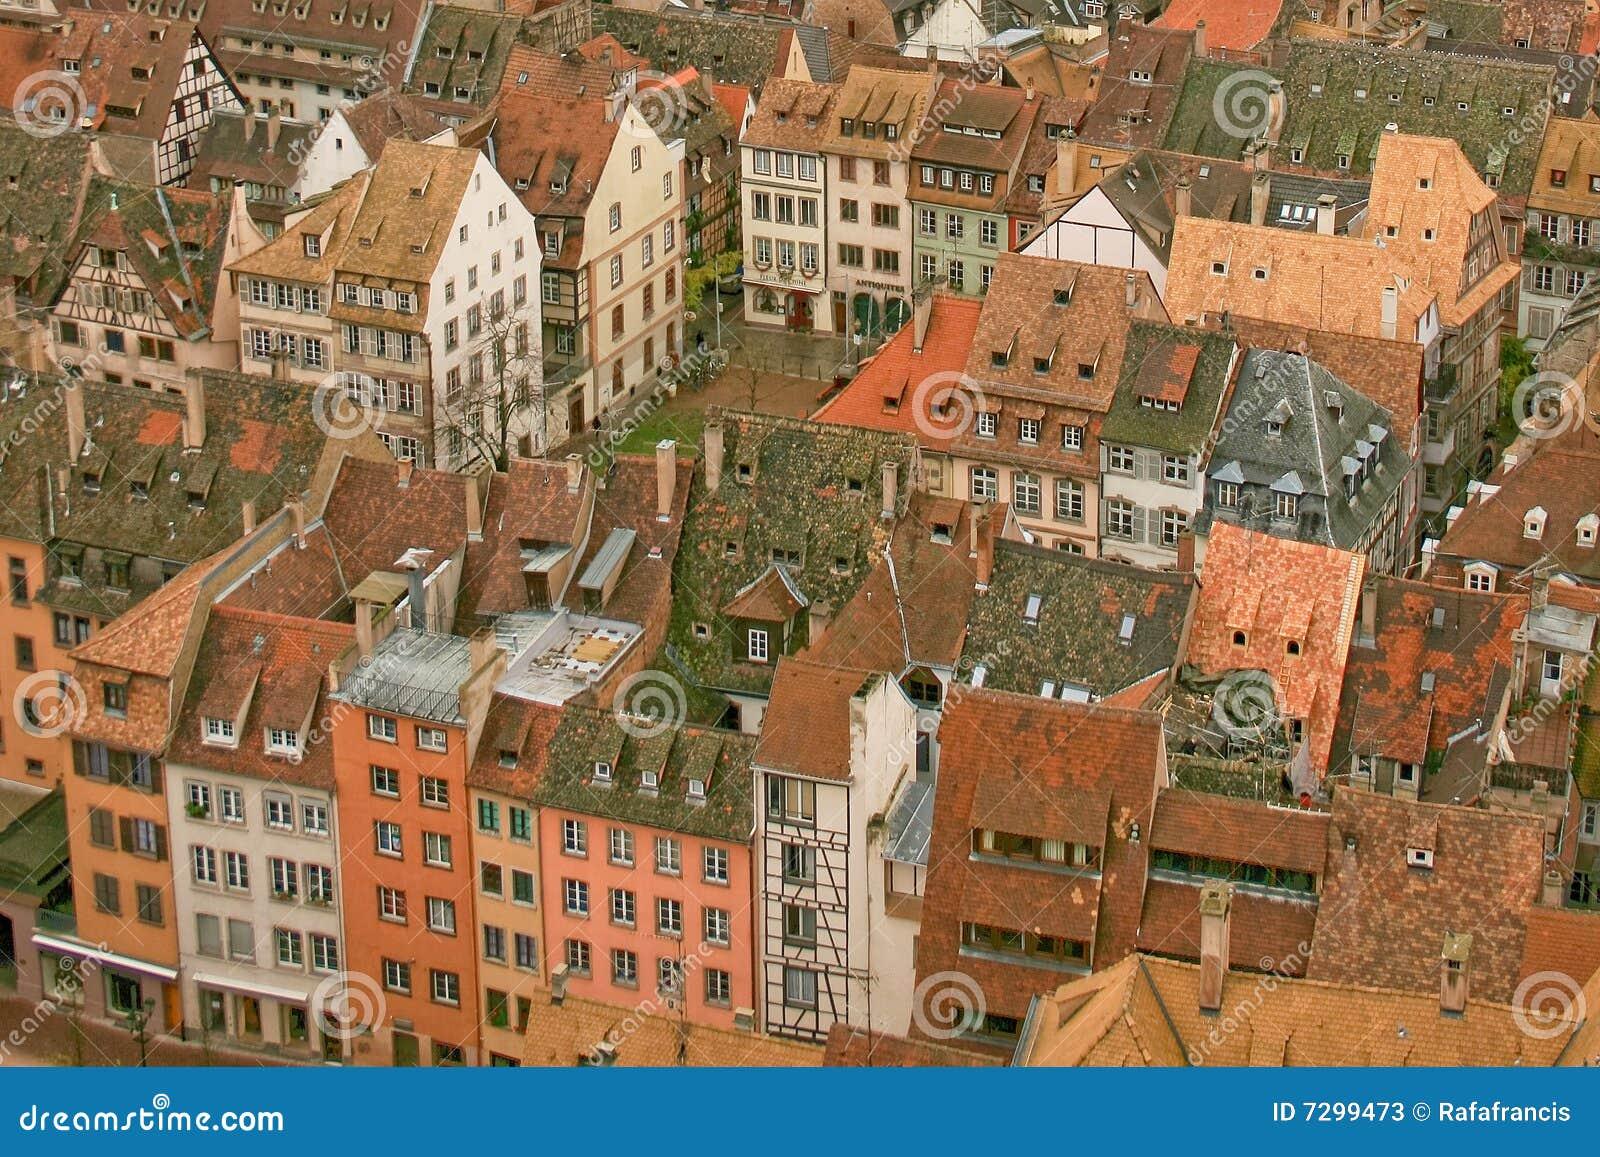 Strasbourg in alsace france stock photos image 7299473 for Alsace carrelage strasbourg